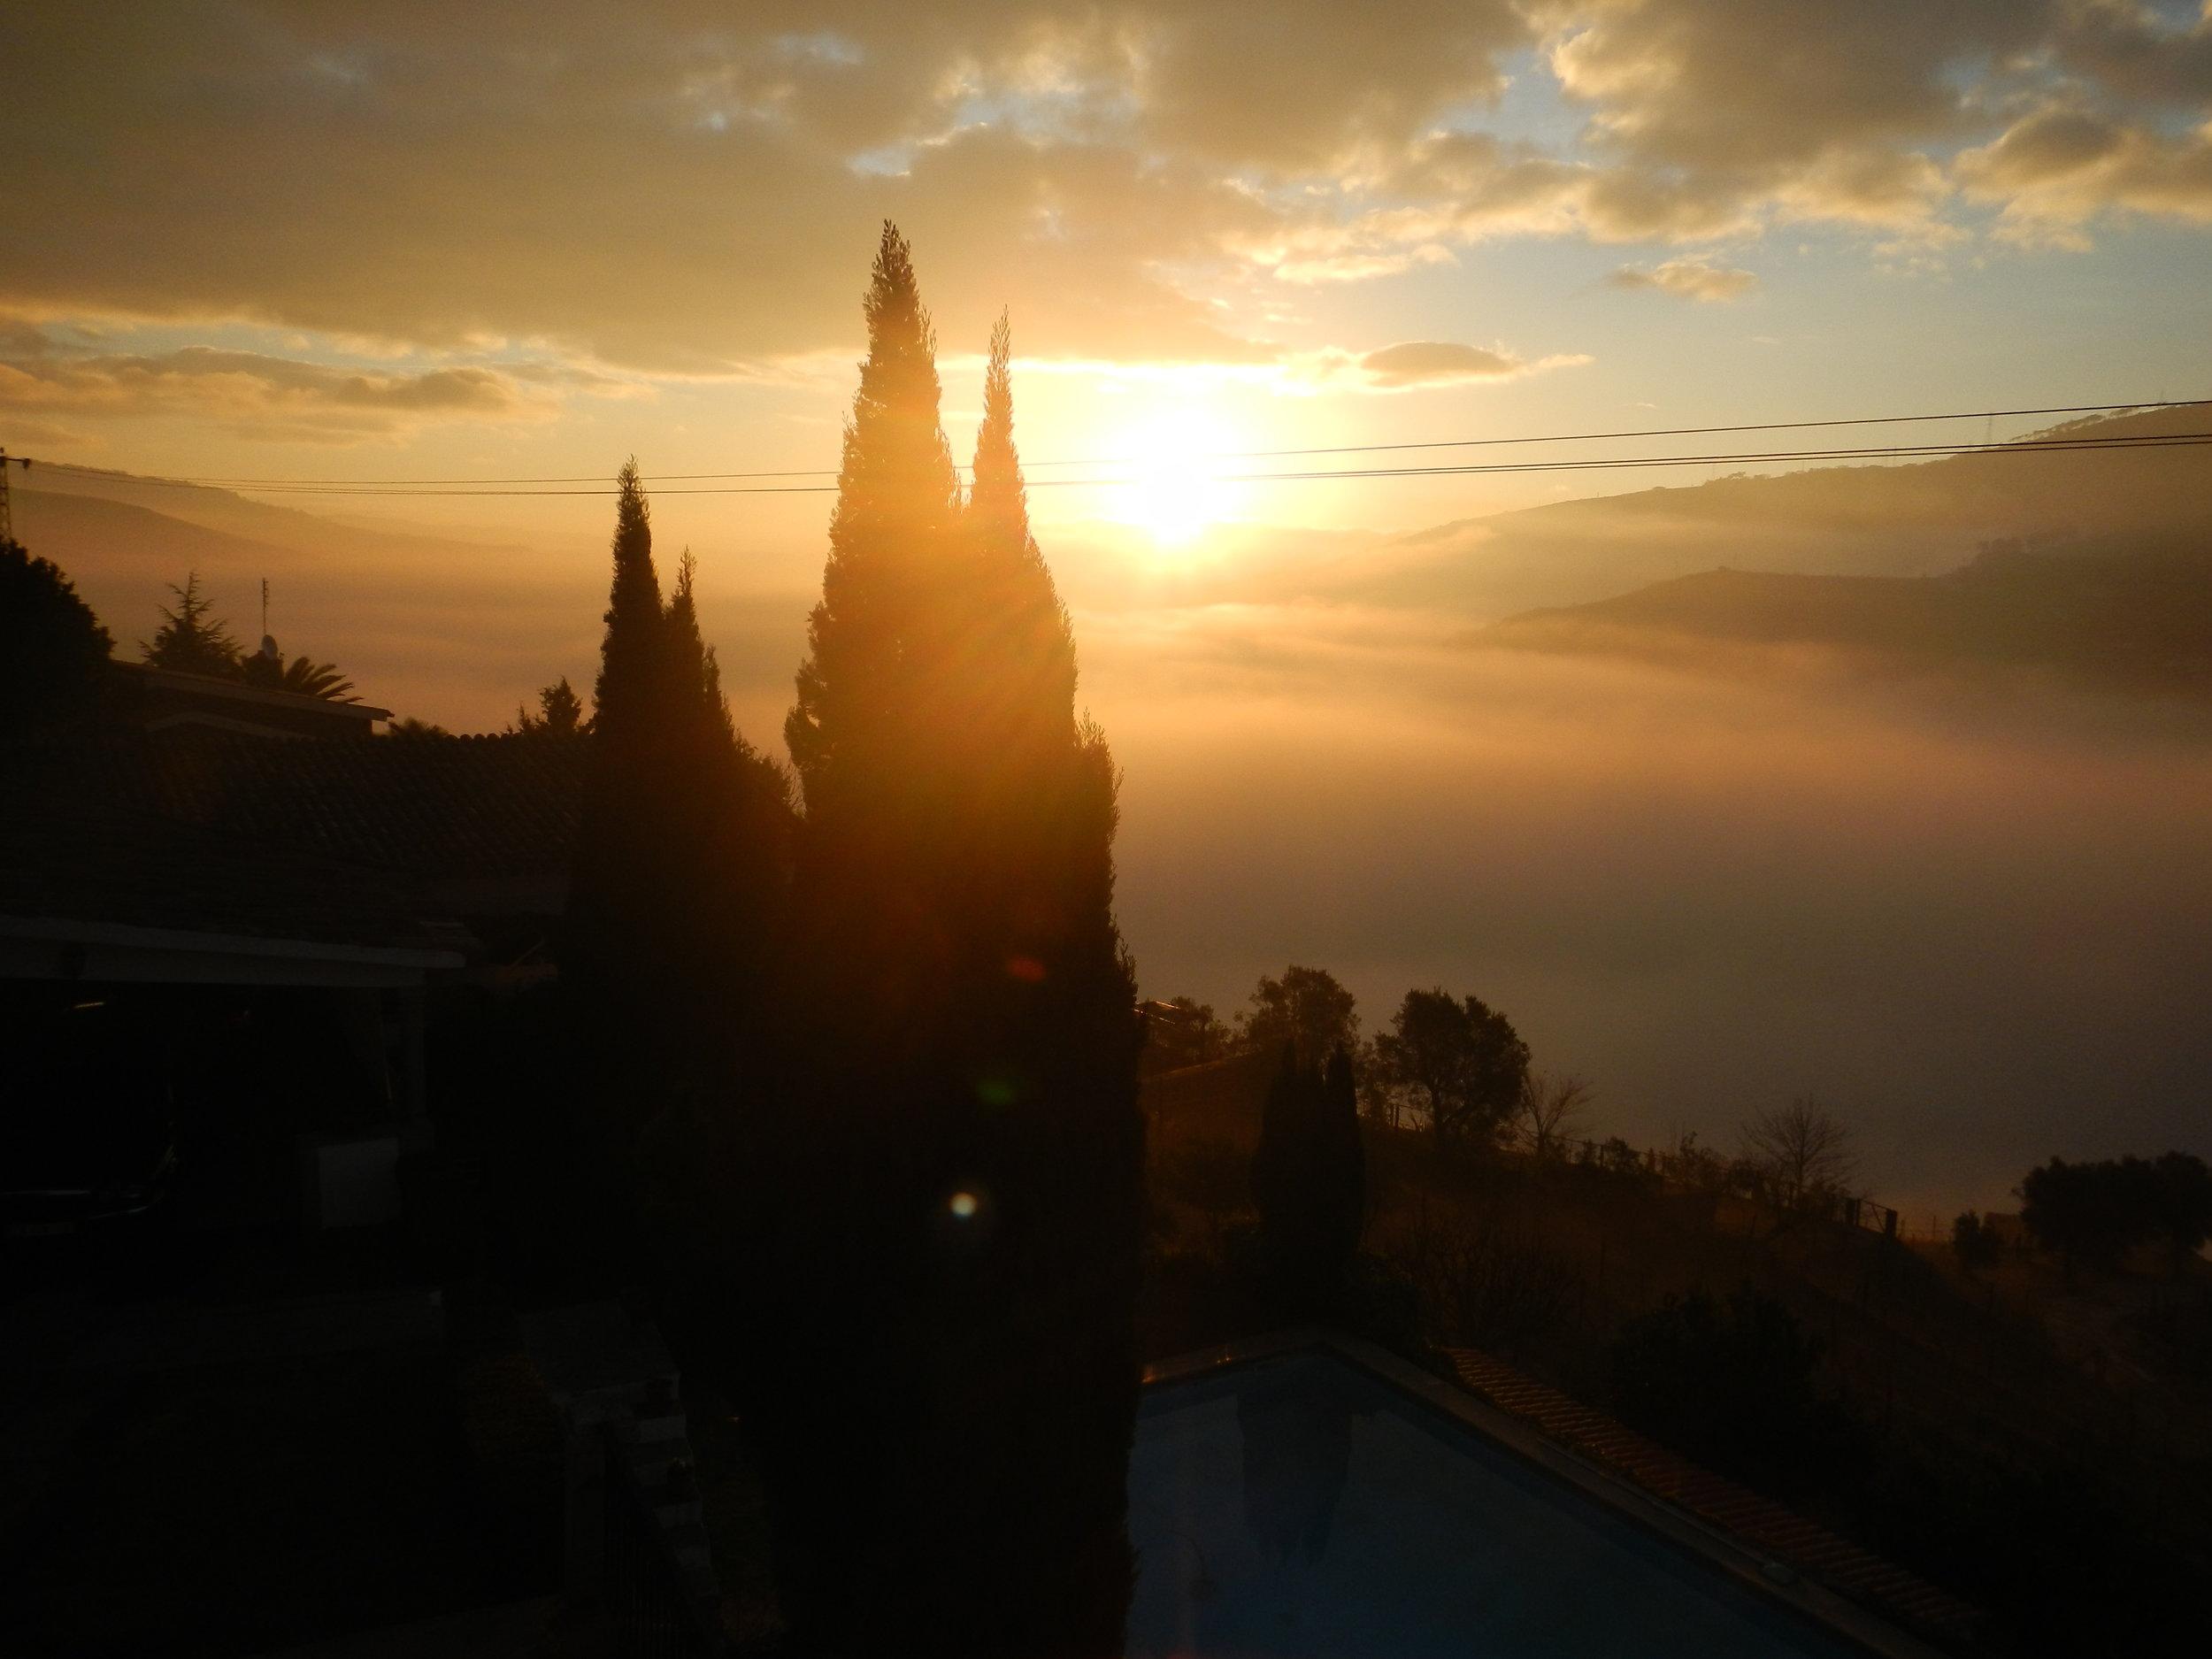 Sunrise Douro Valley Vacation